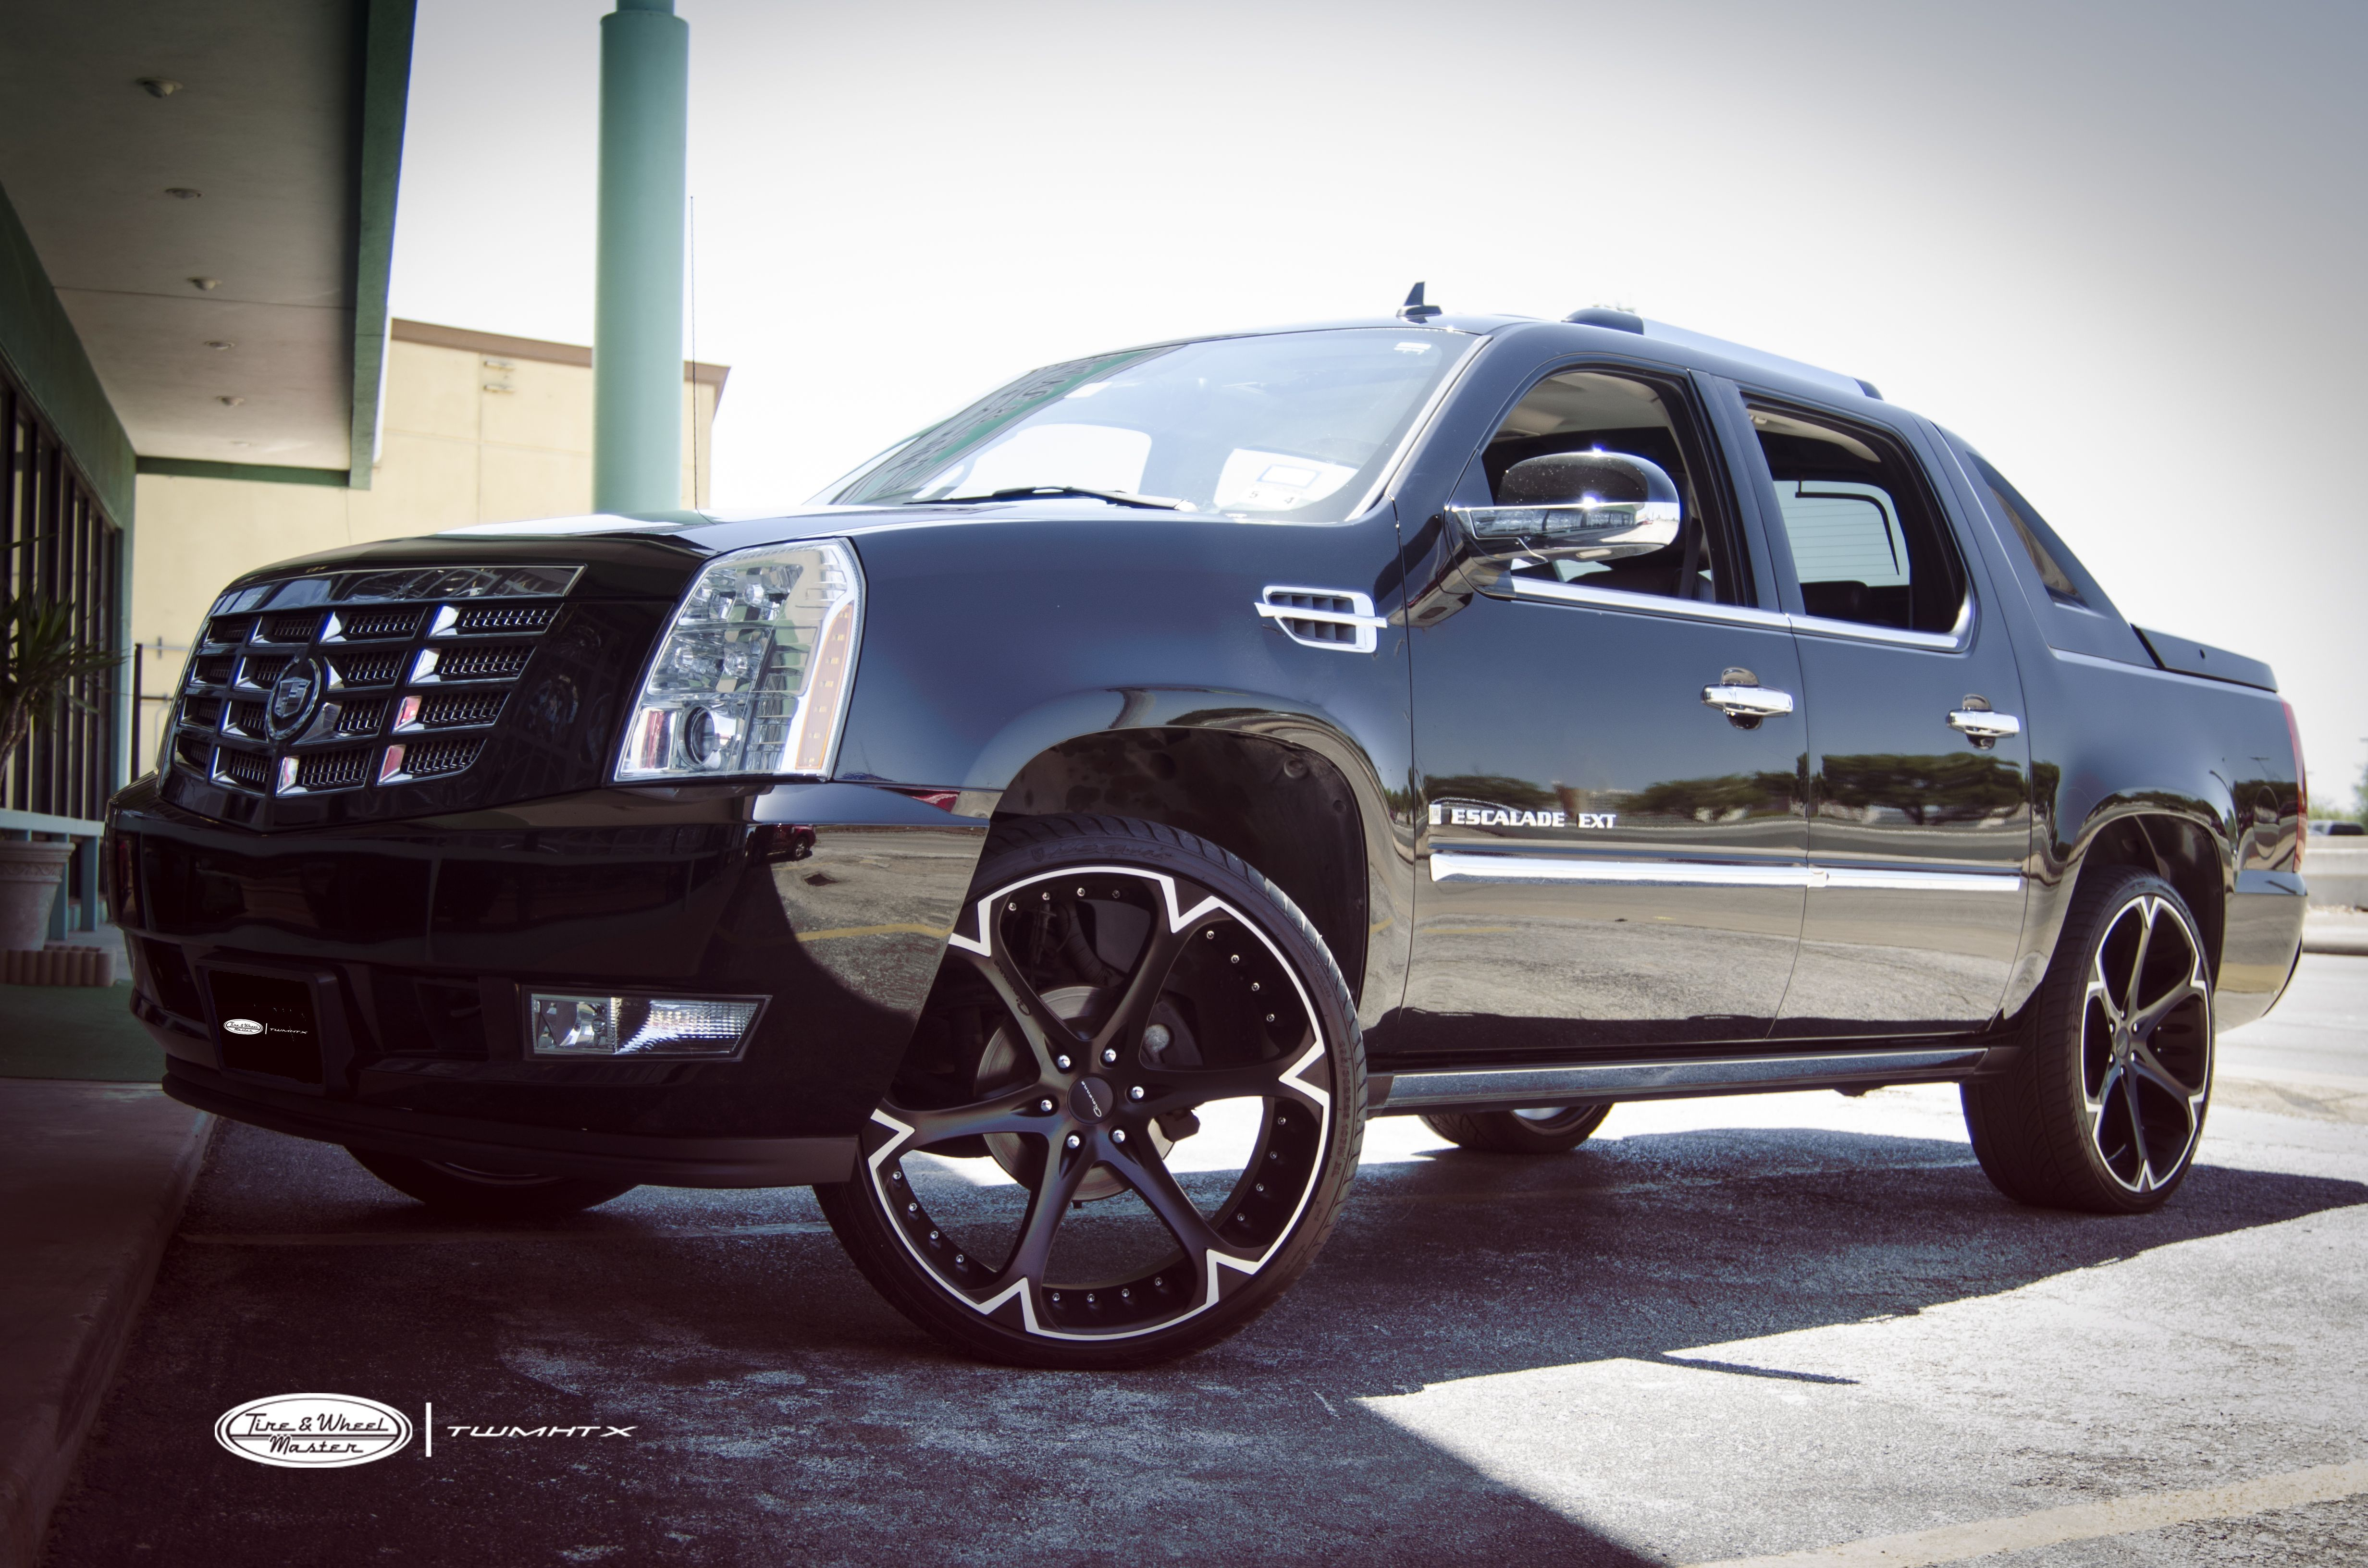 Black Cadillac Escalade EXT with 26 inch Giovanna Wheels ...